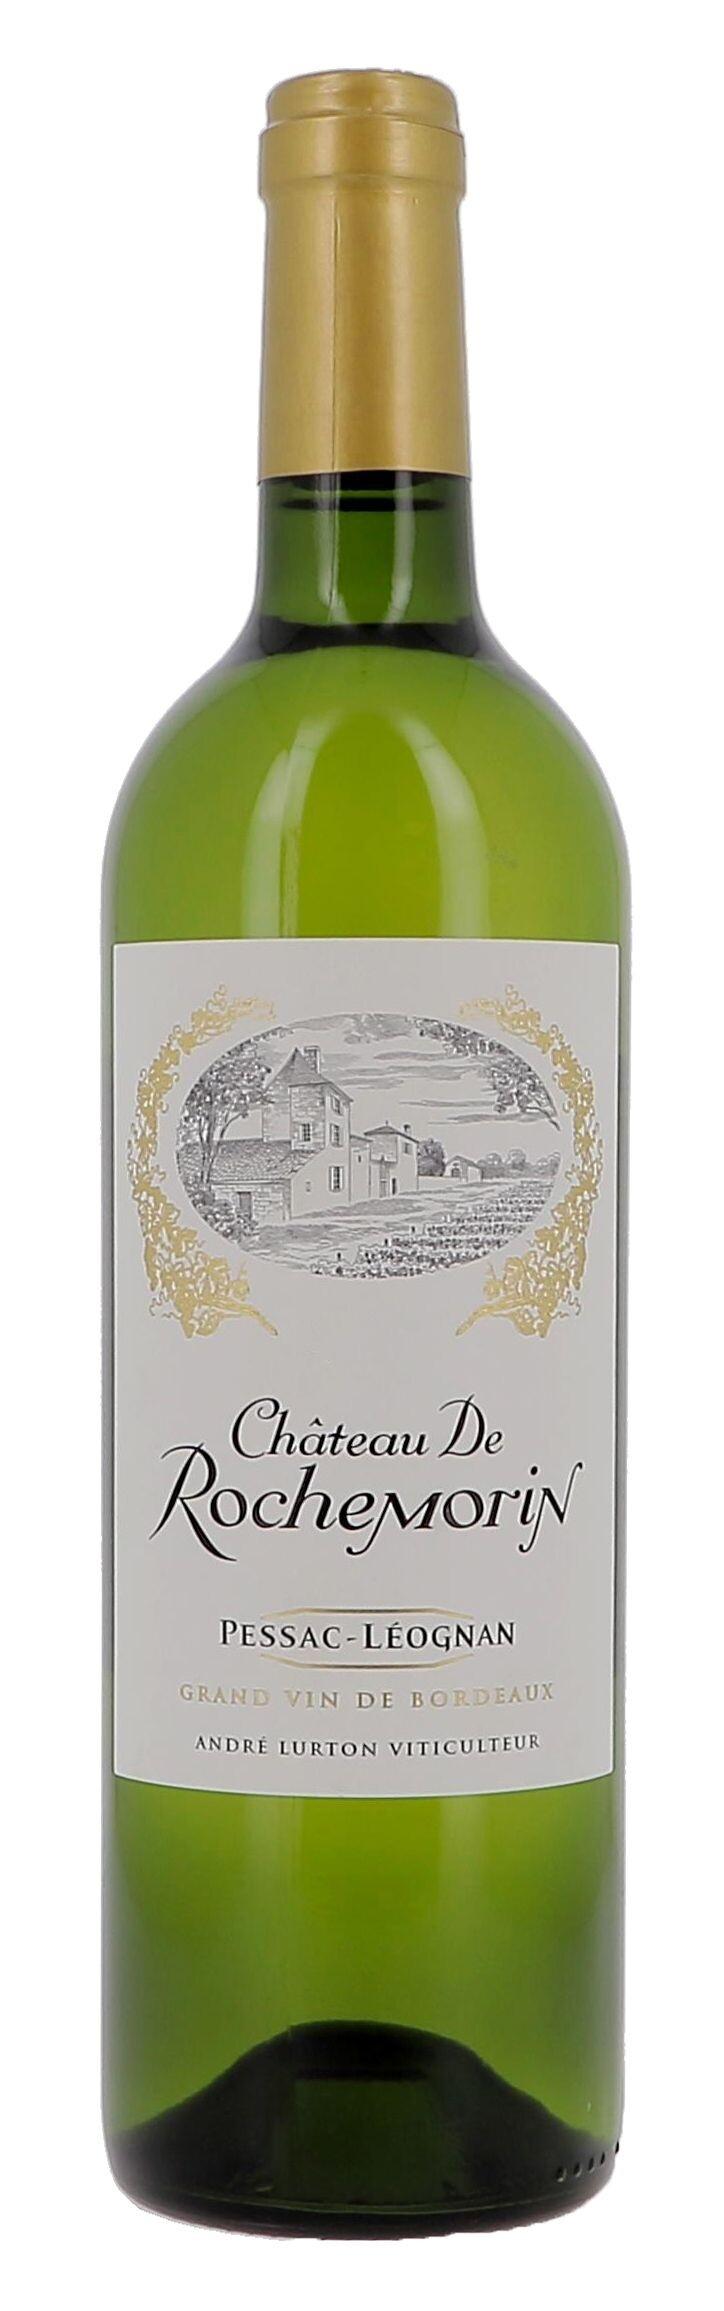 Chateau De Rochemorin wit 75cl 2017 Pessac Leognan Andre Lurton (Wijnen)